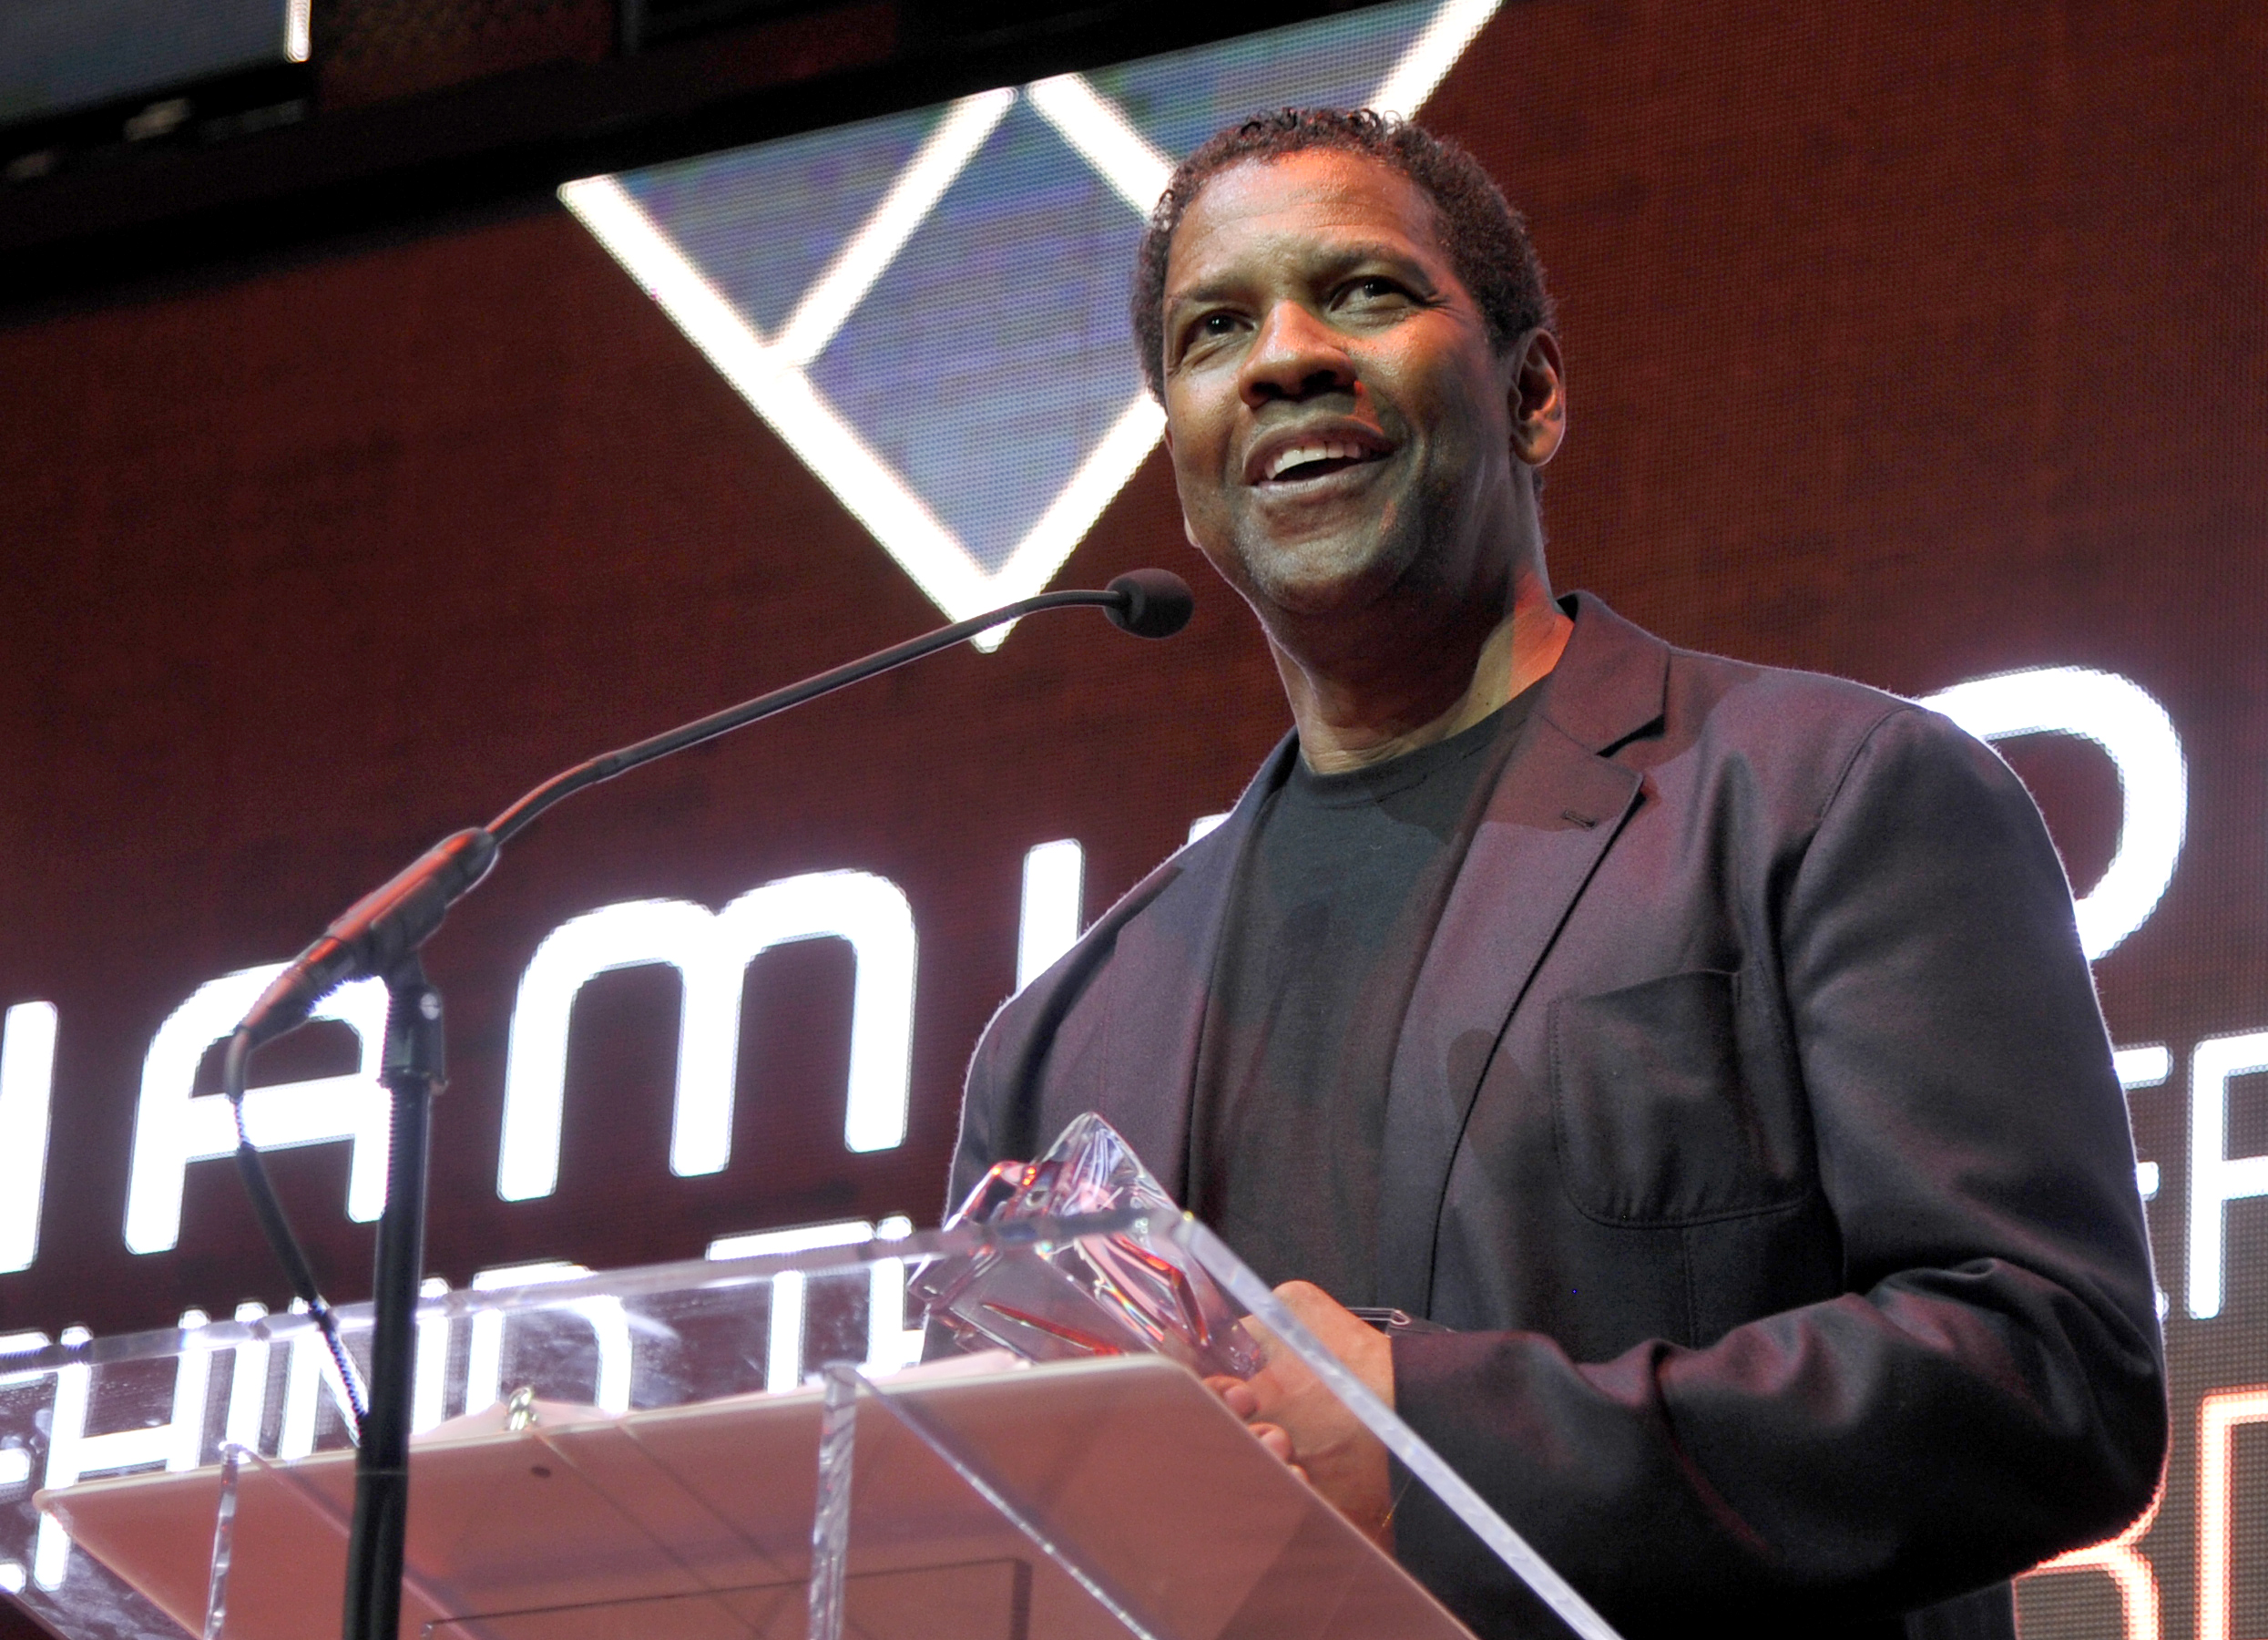 Hamilton Behind The Camera Awards Presented By Los Angeles Confidential Magazine At Exchange LA Of Los Angeles - Inside